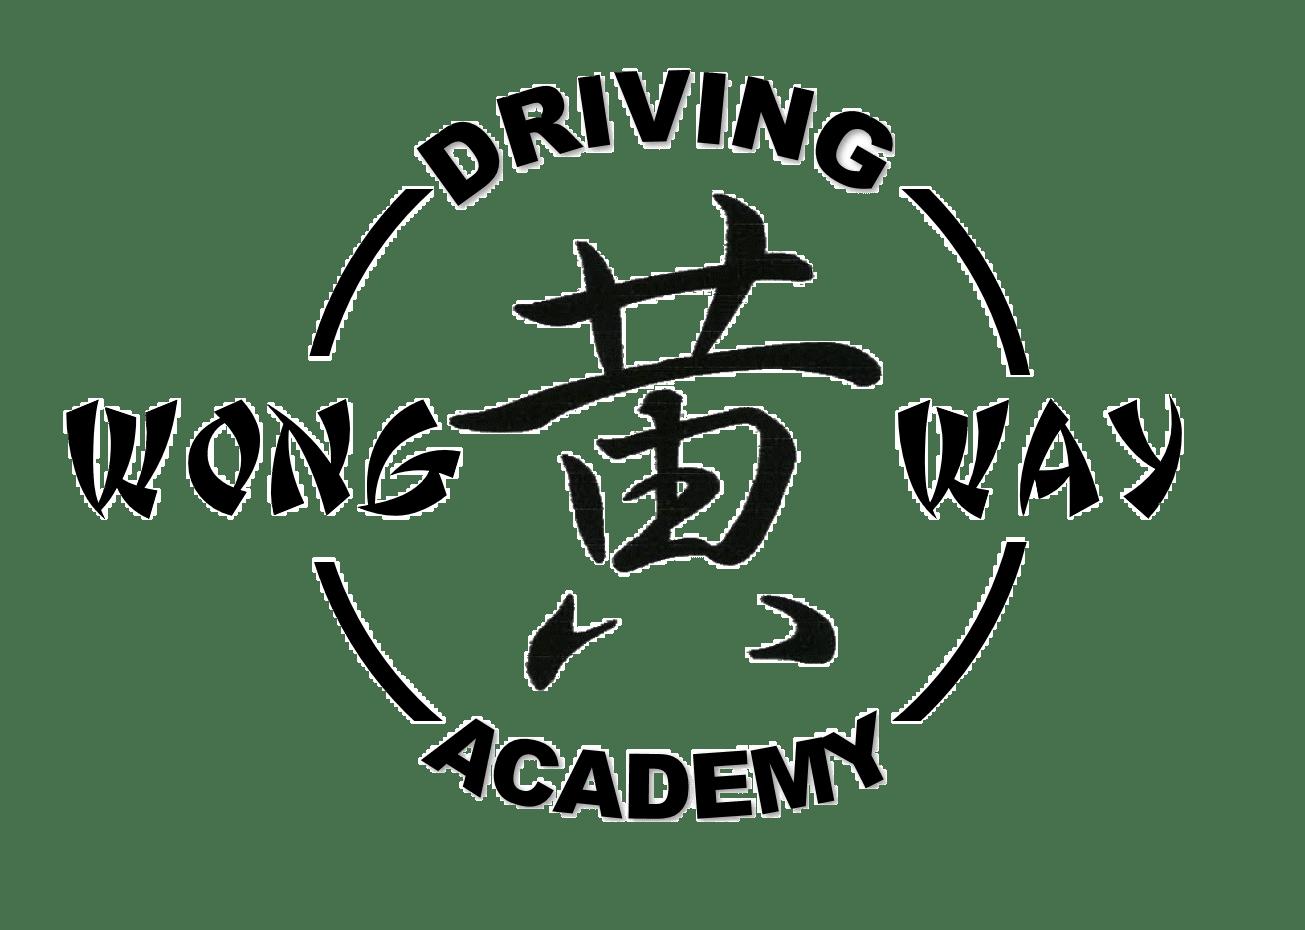 Wong Way Driving Academy